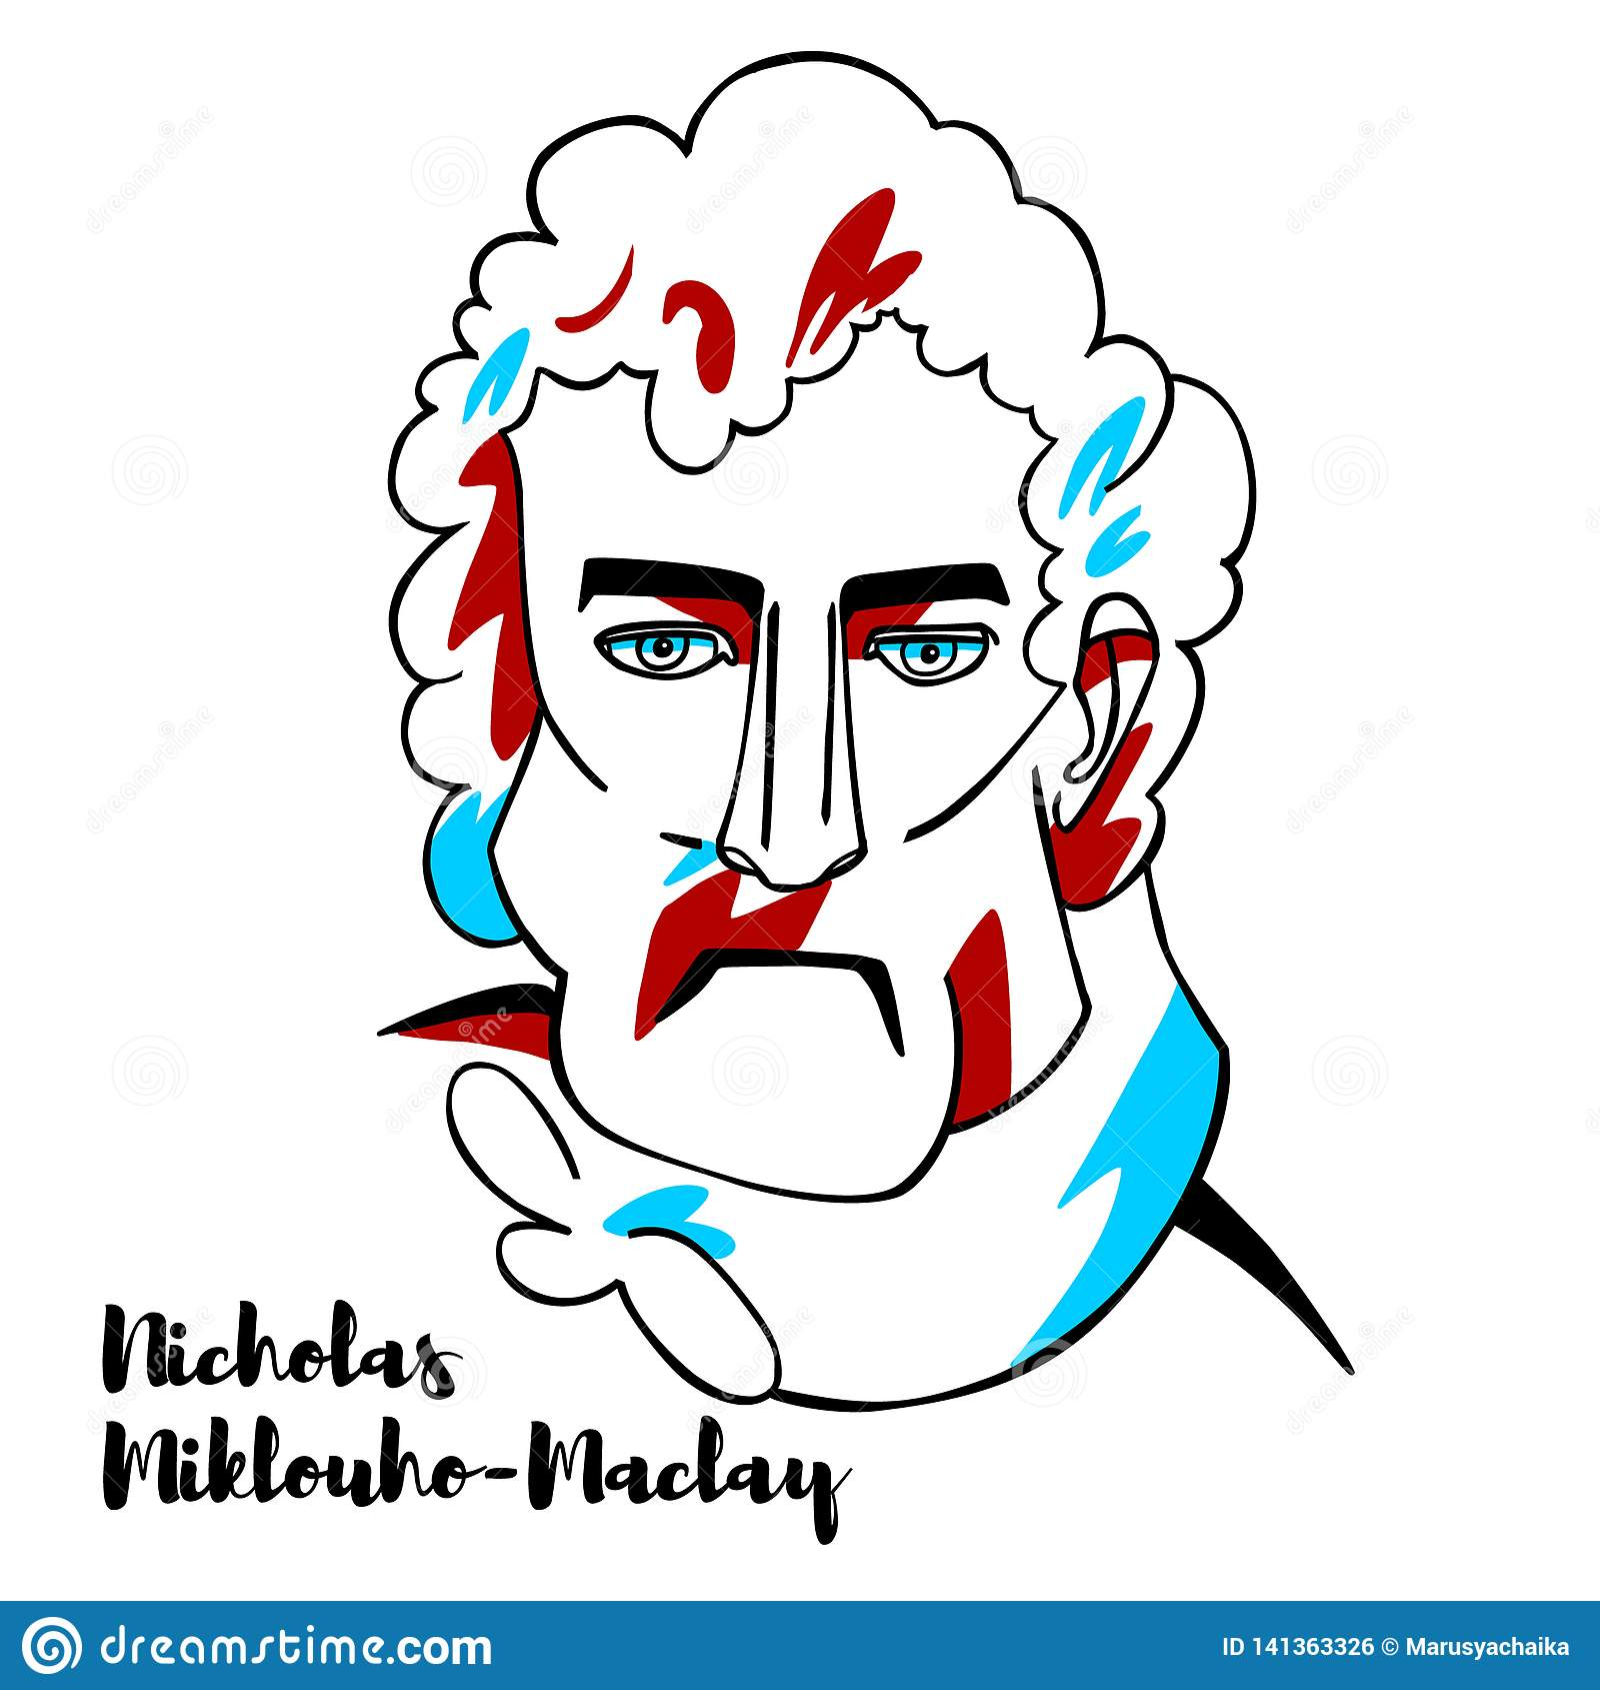 Nicholas Miklouho-Maclay Portrait